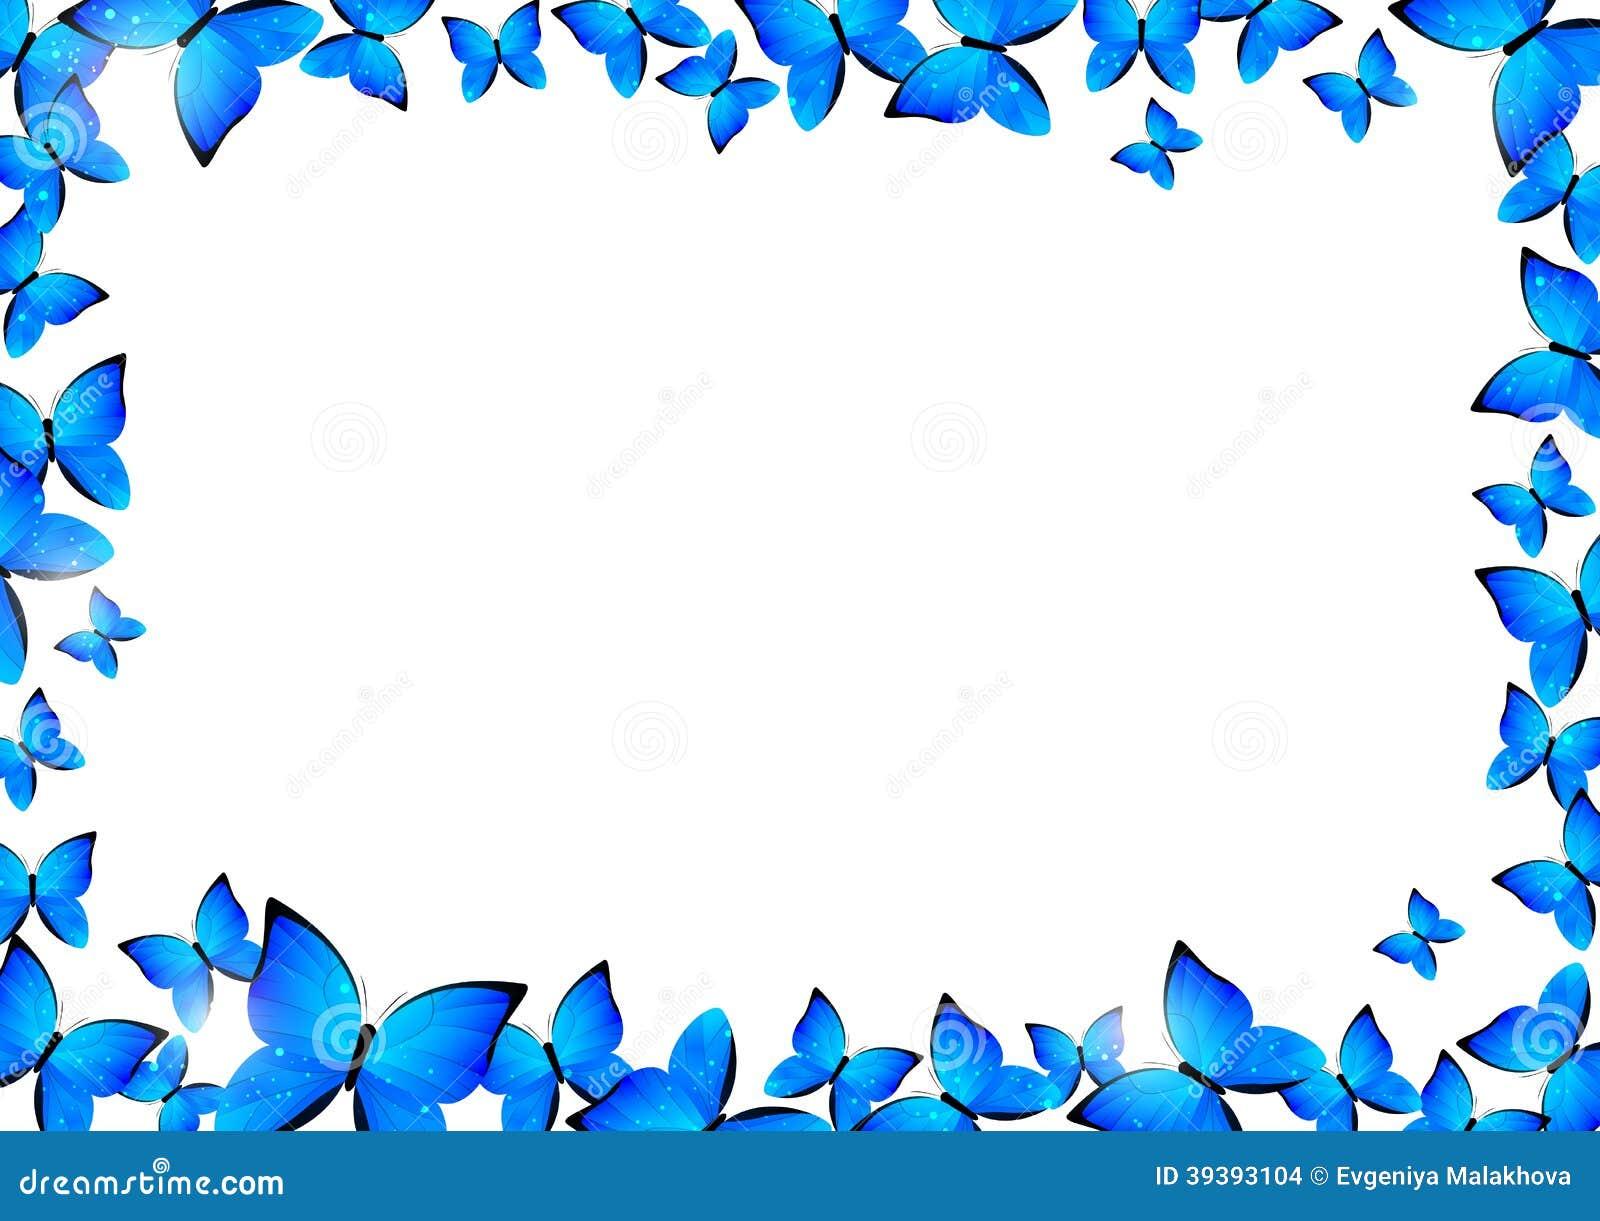 blue butterflies border stock vector  illustration of elegant